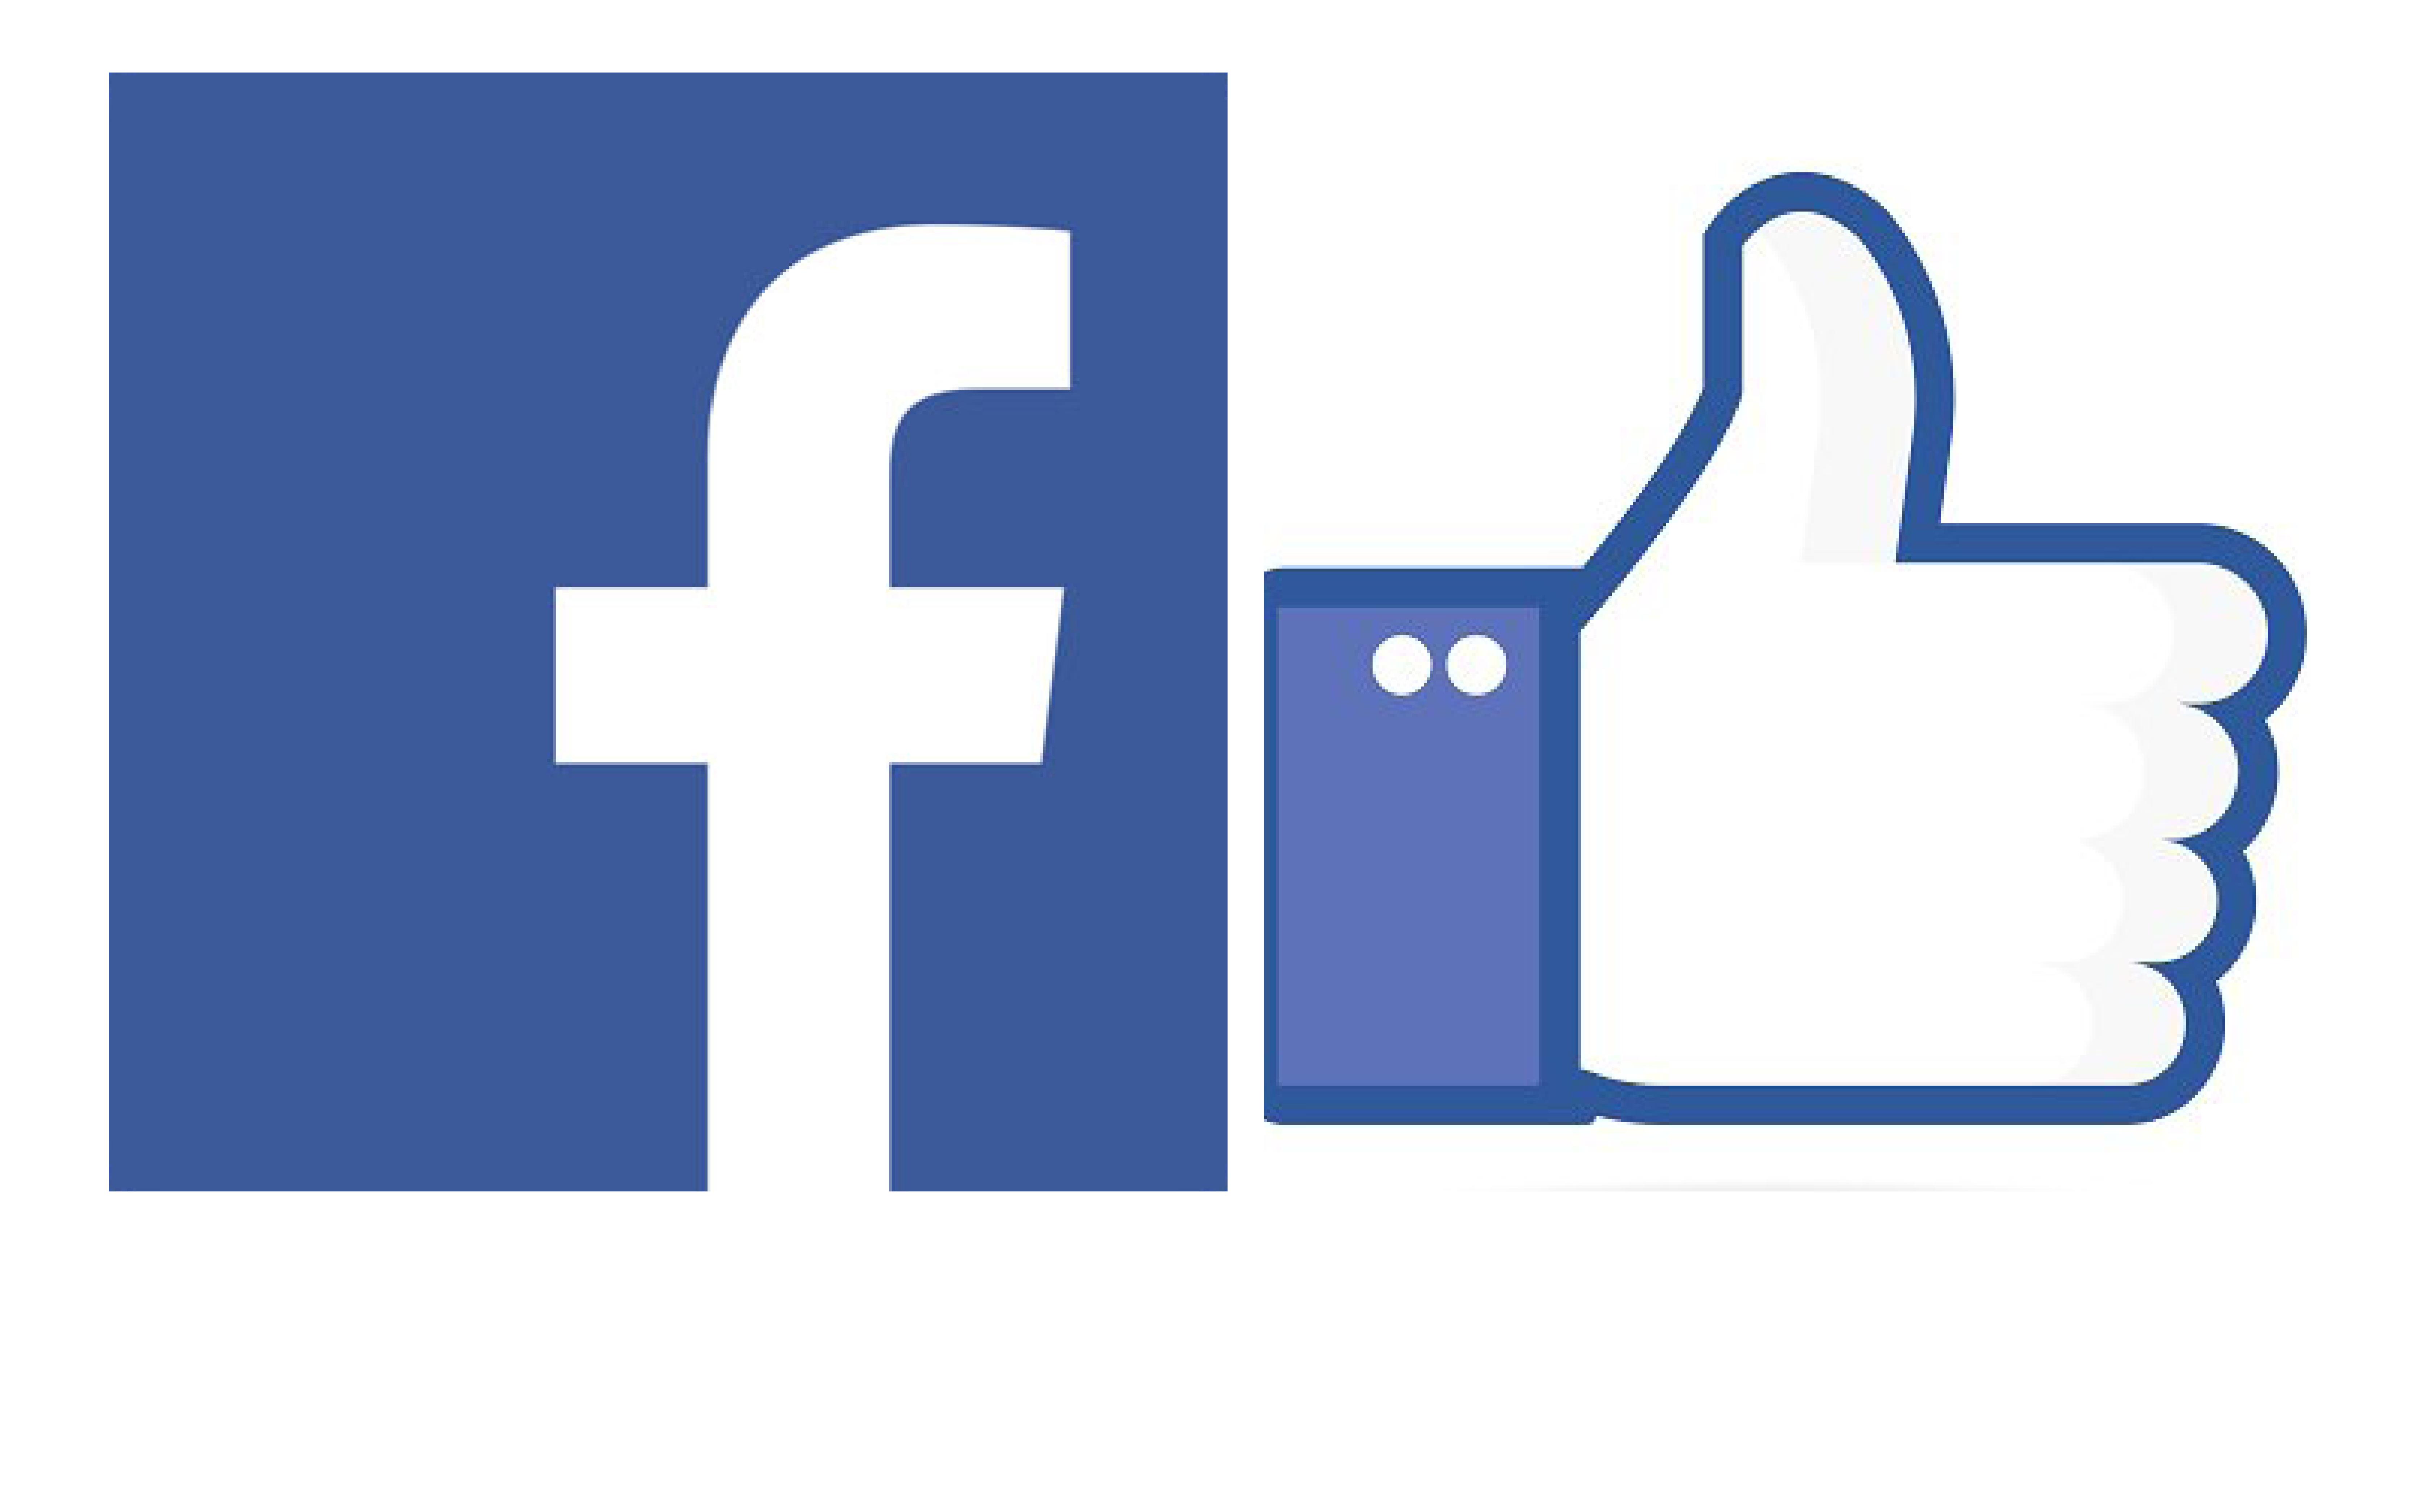 F de facebook clipart clip stock Facebook for Small Businesses: Session 1 – JPNDC clip stock